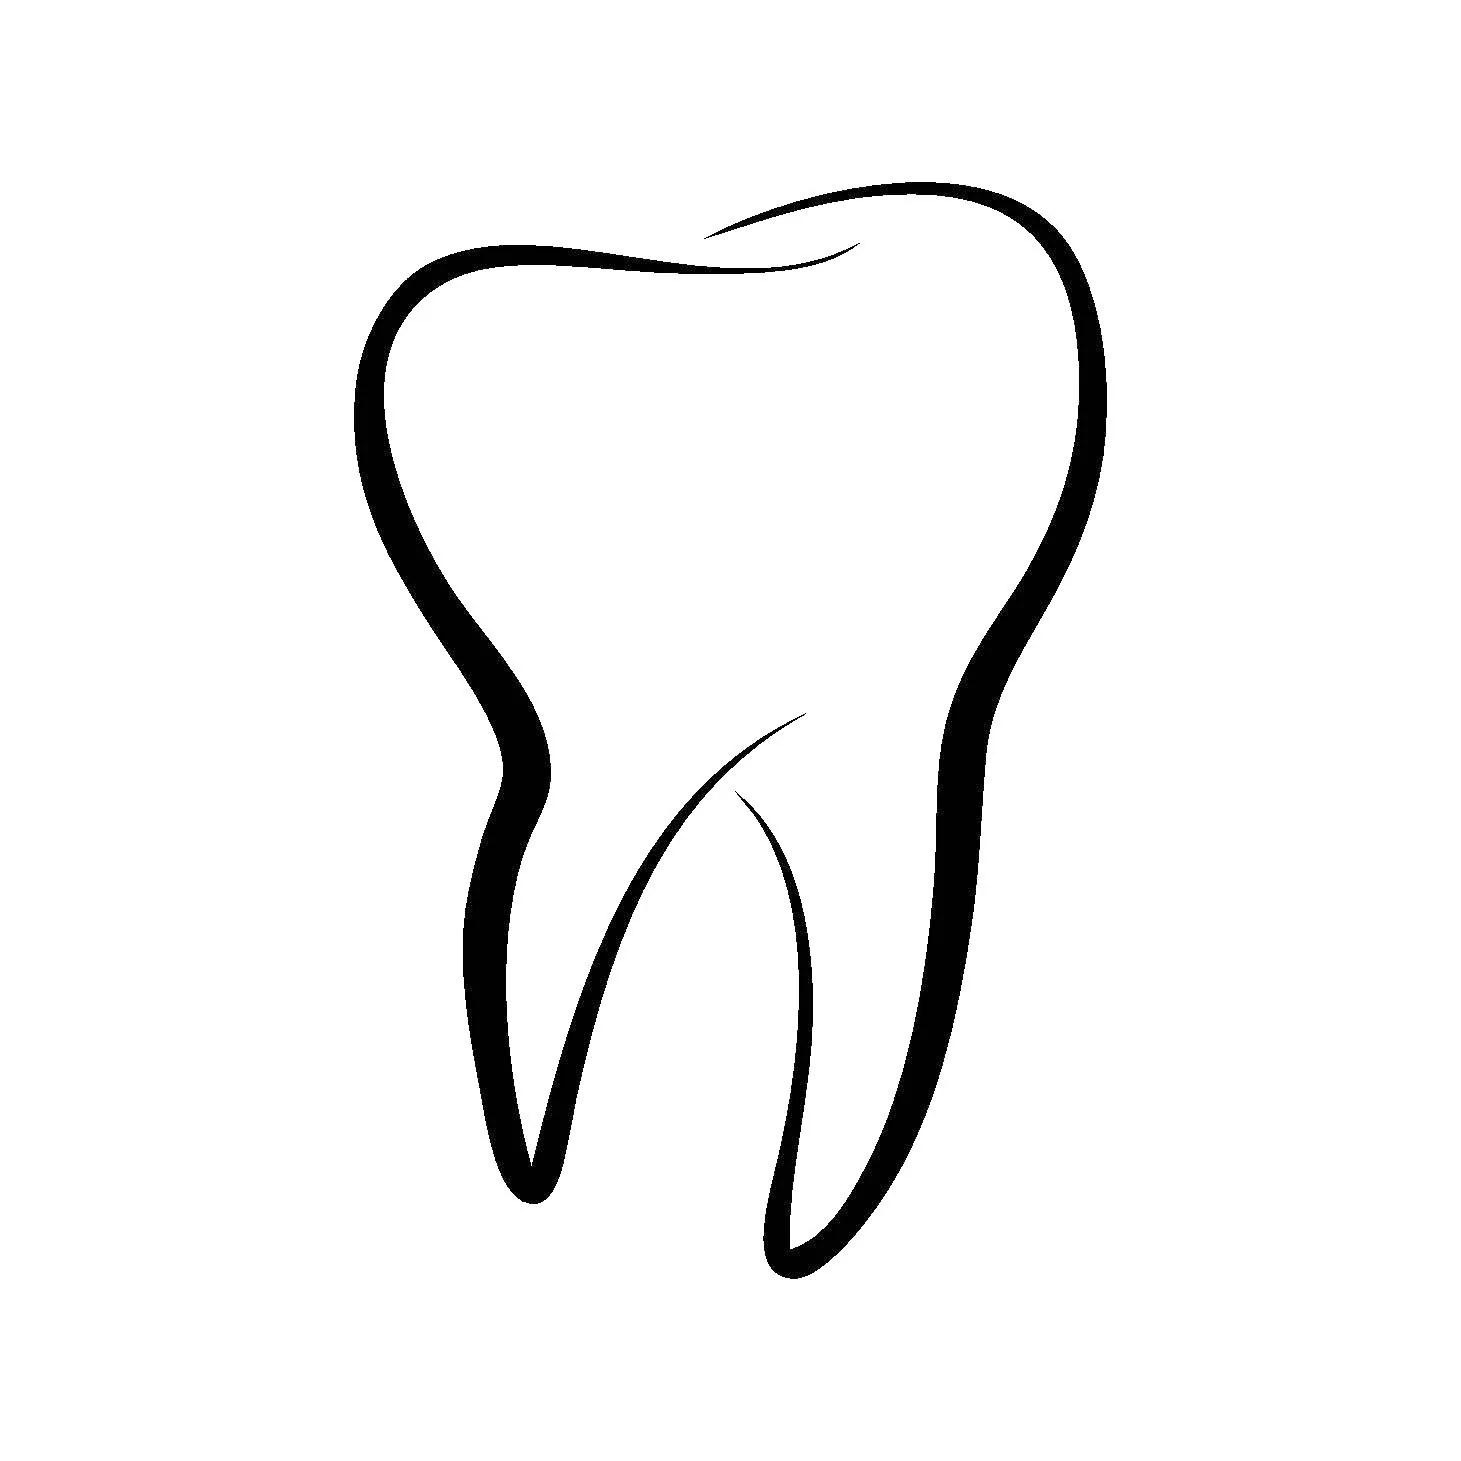 Zahn Zahnarzt Zahntechnik Dental Care Grafiken Svg Dxf Eps